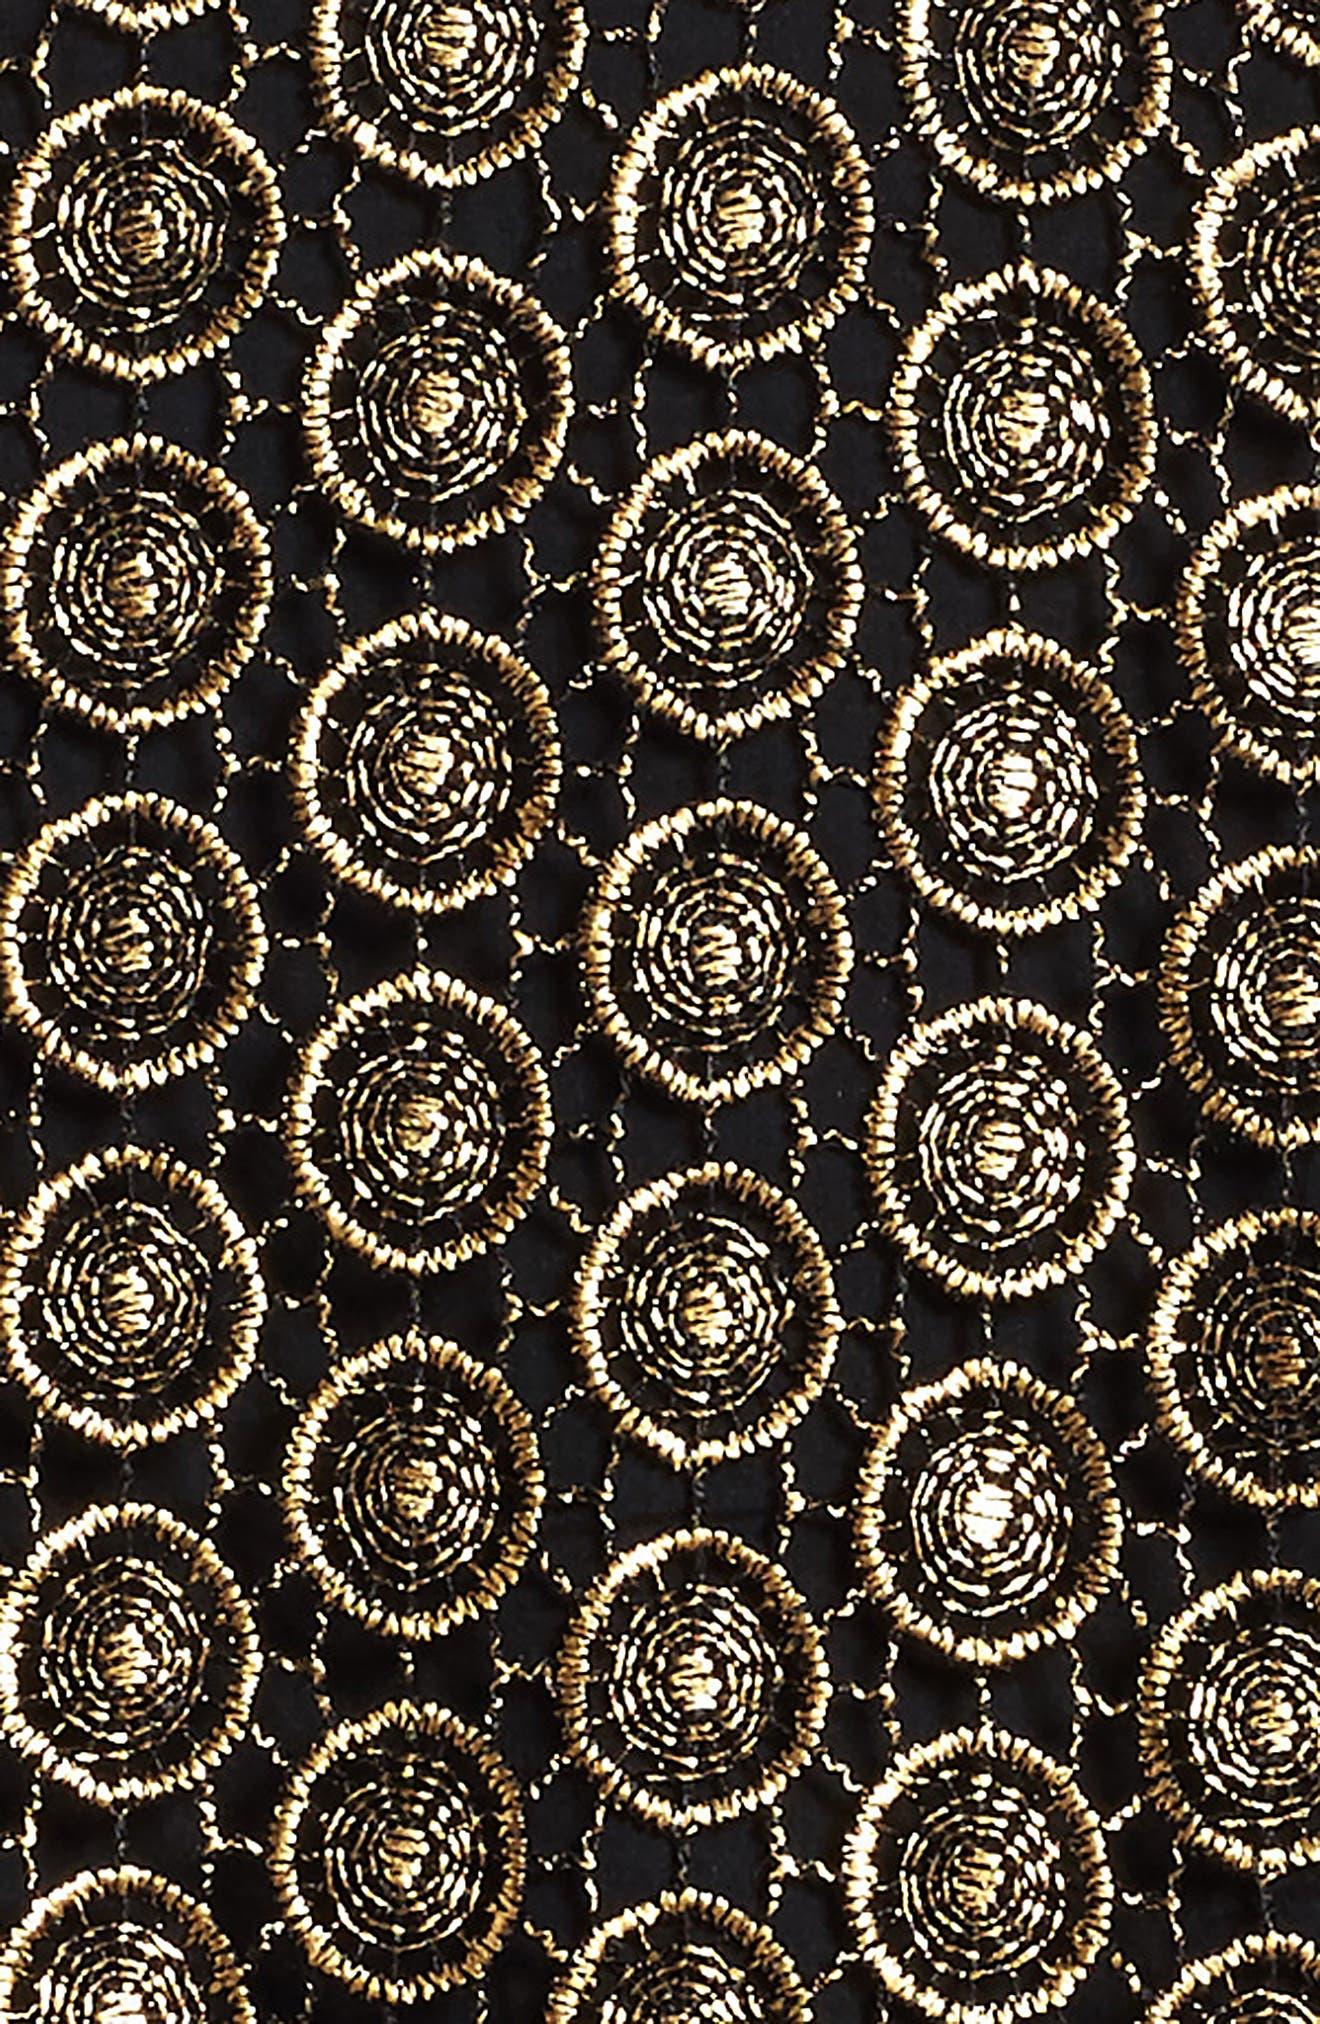 Metallic Lace Dress,                             Alternate thumbnail 3, color,                             010